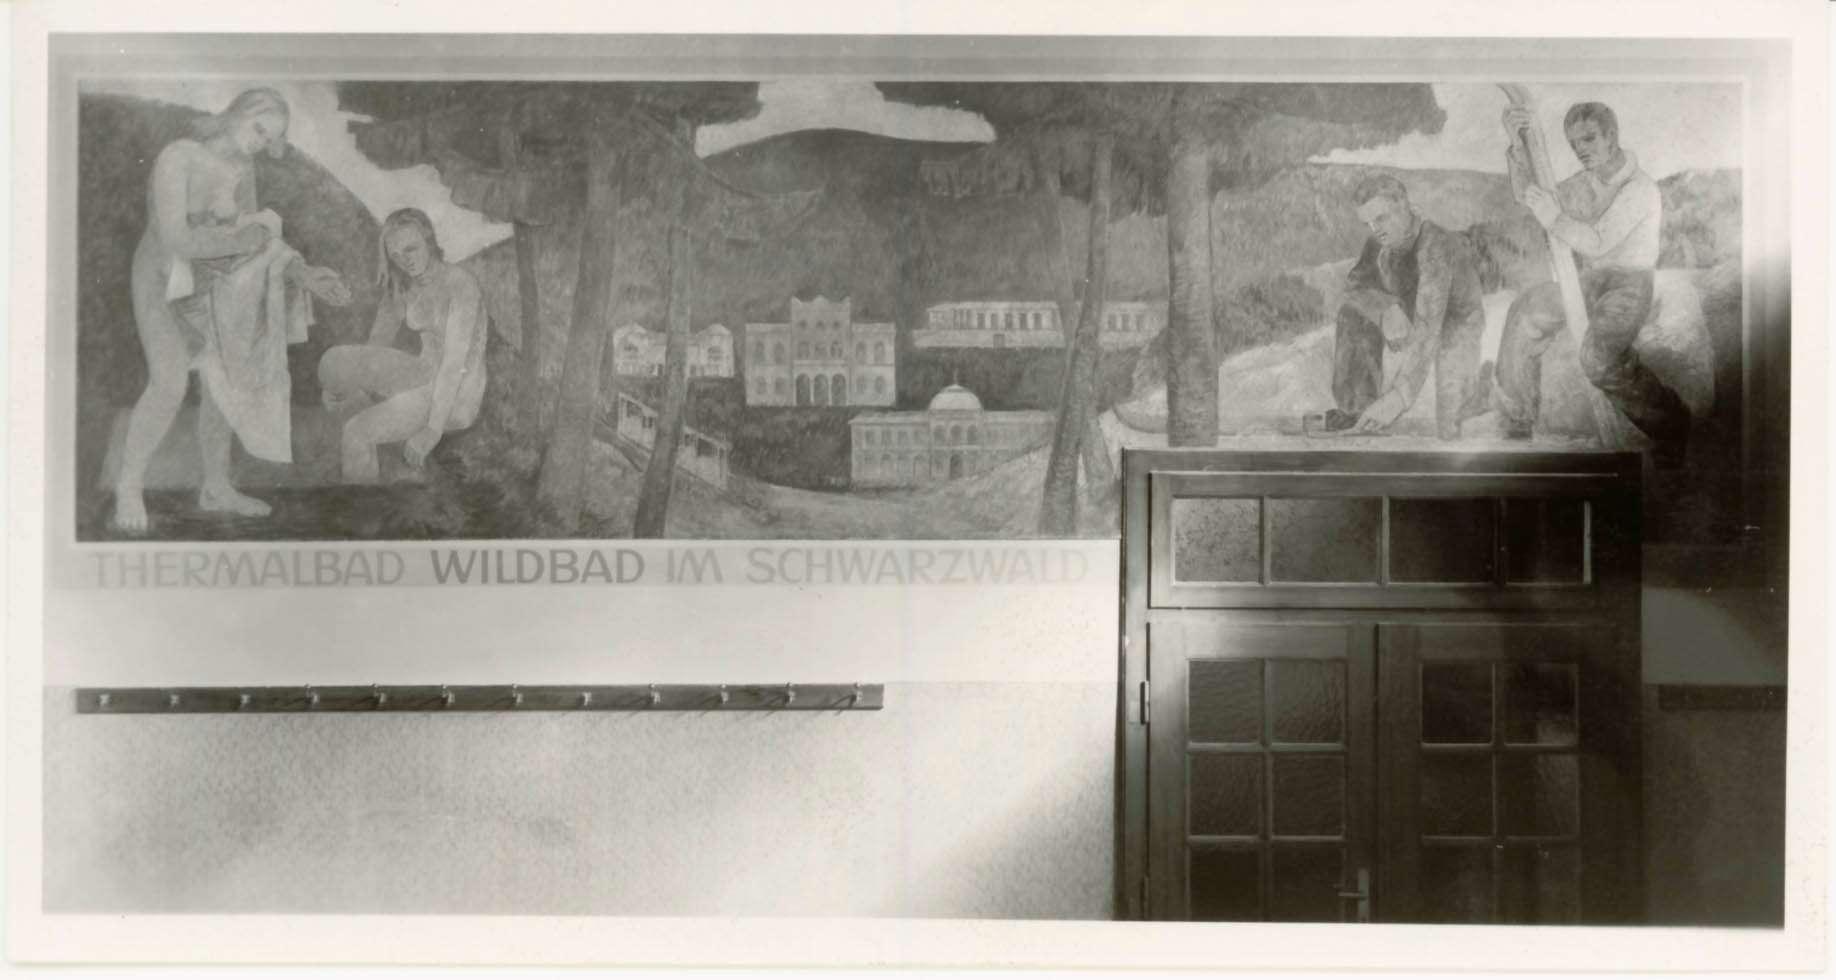 Wildbad: 8 Fotos, Bild 1